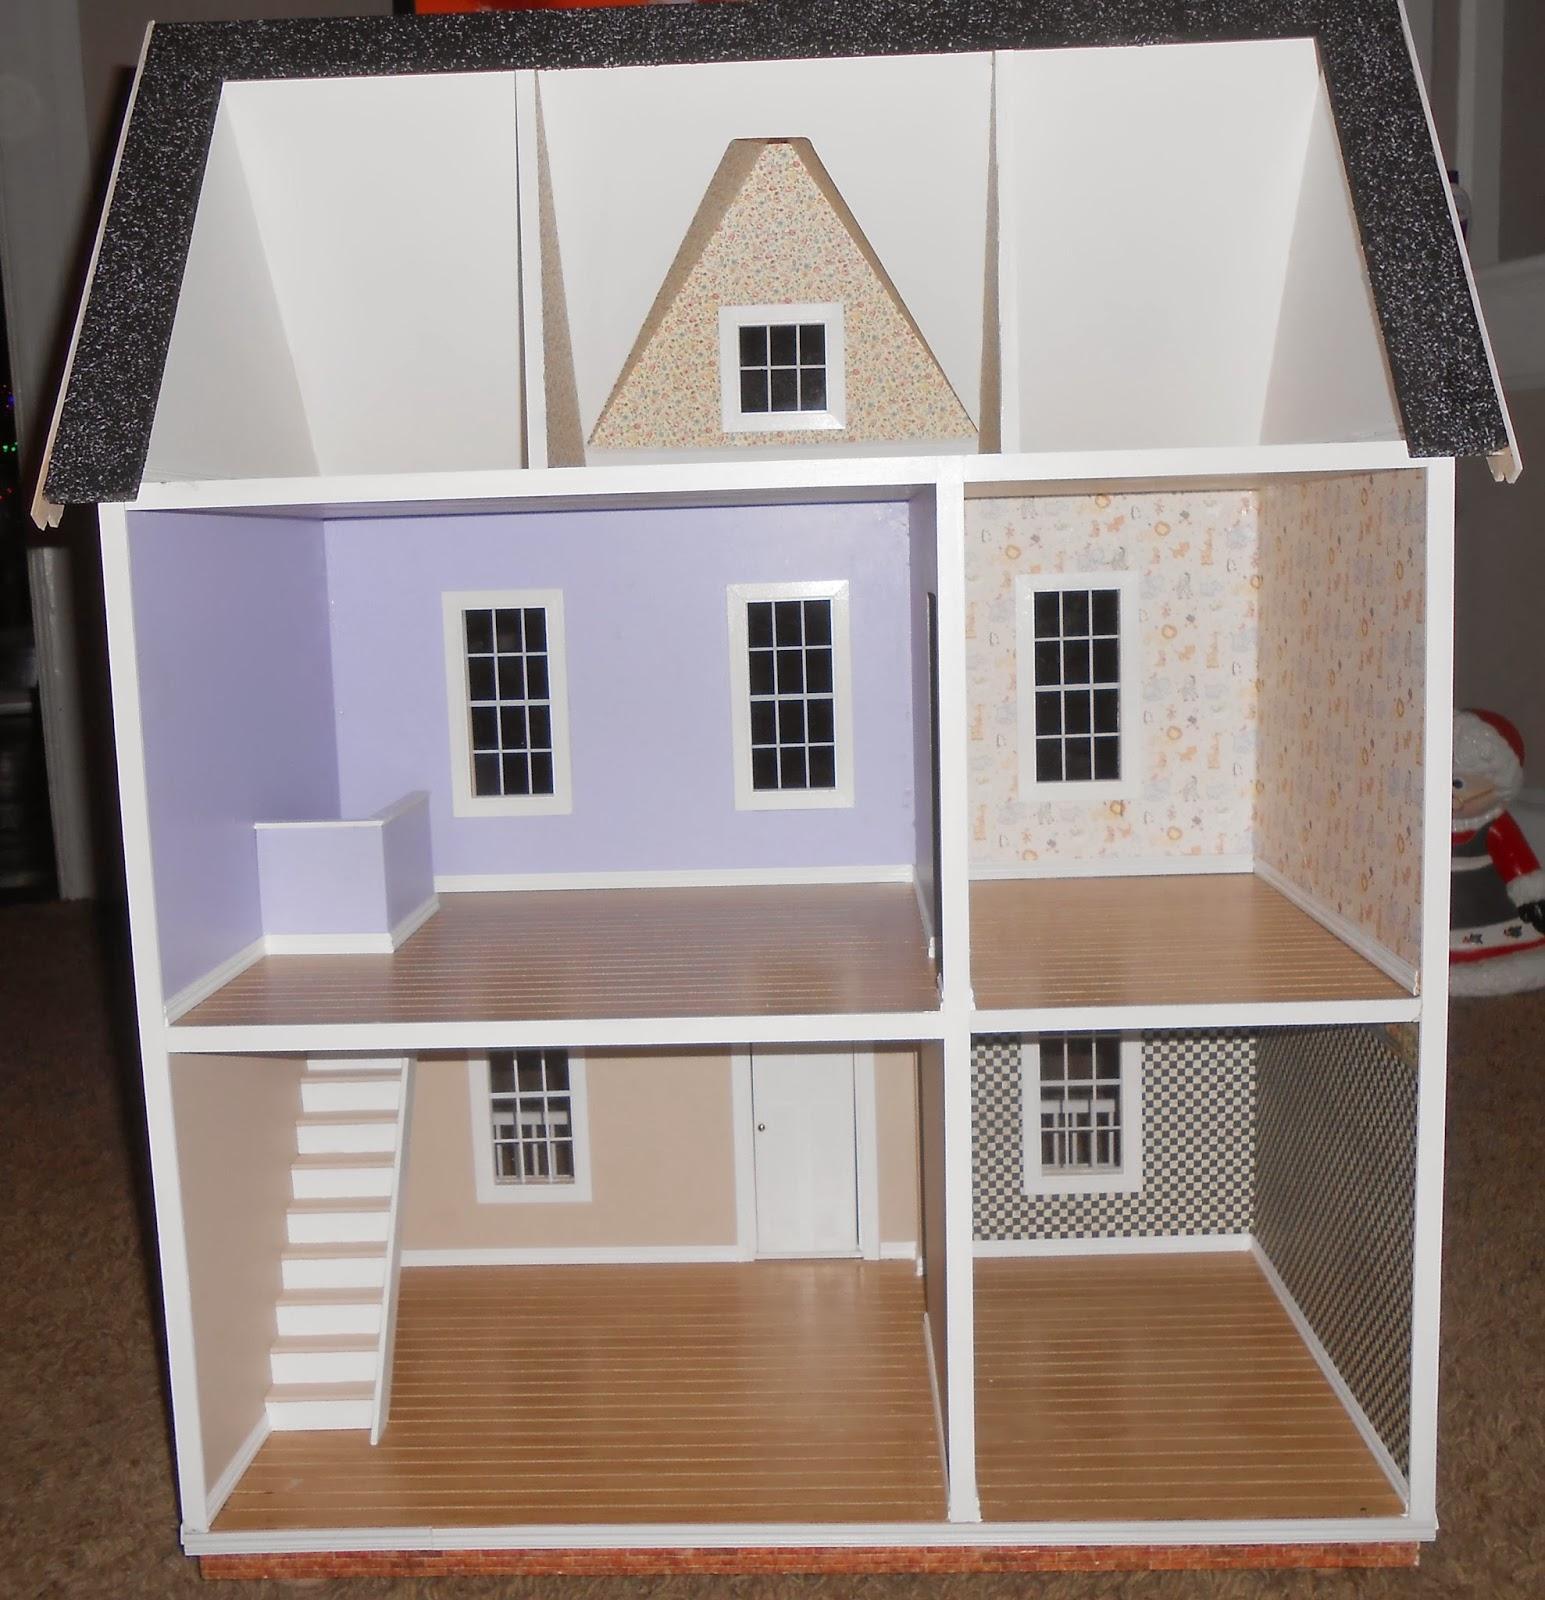 Honey, I Shrunk The House!: RGT Vermont Jr